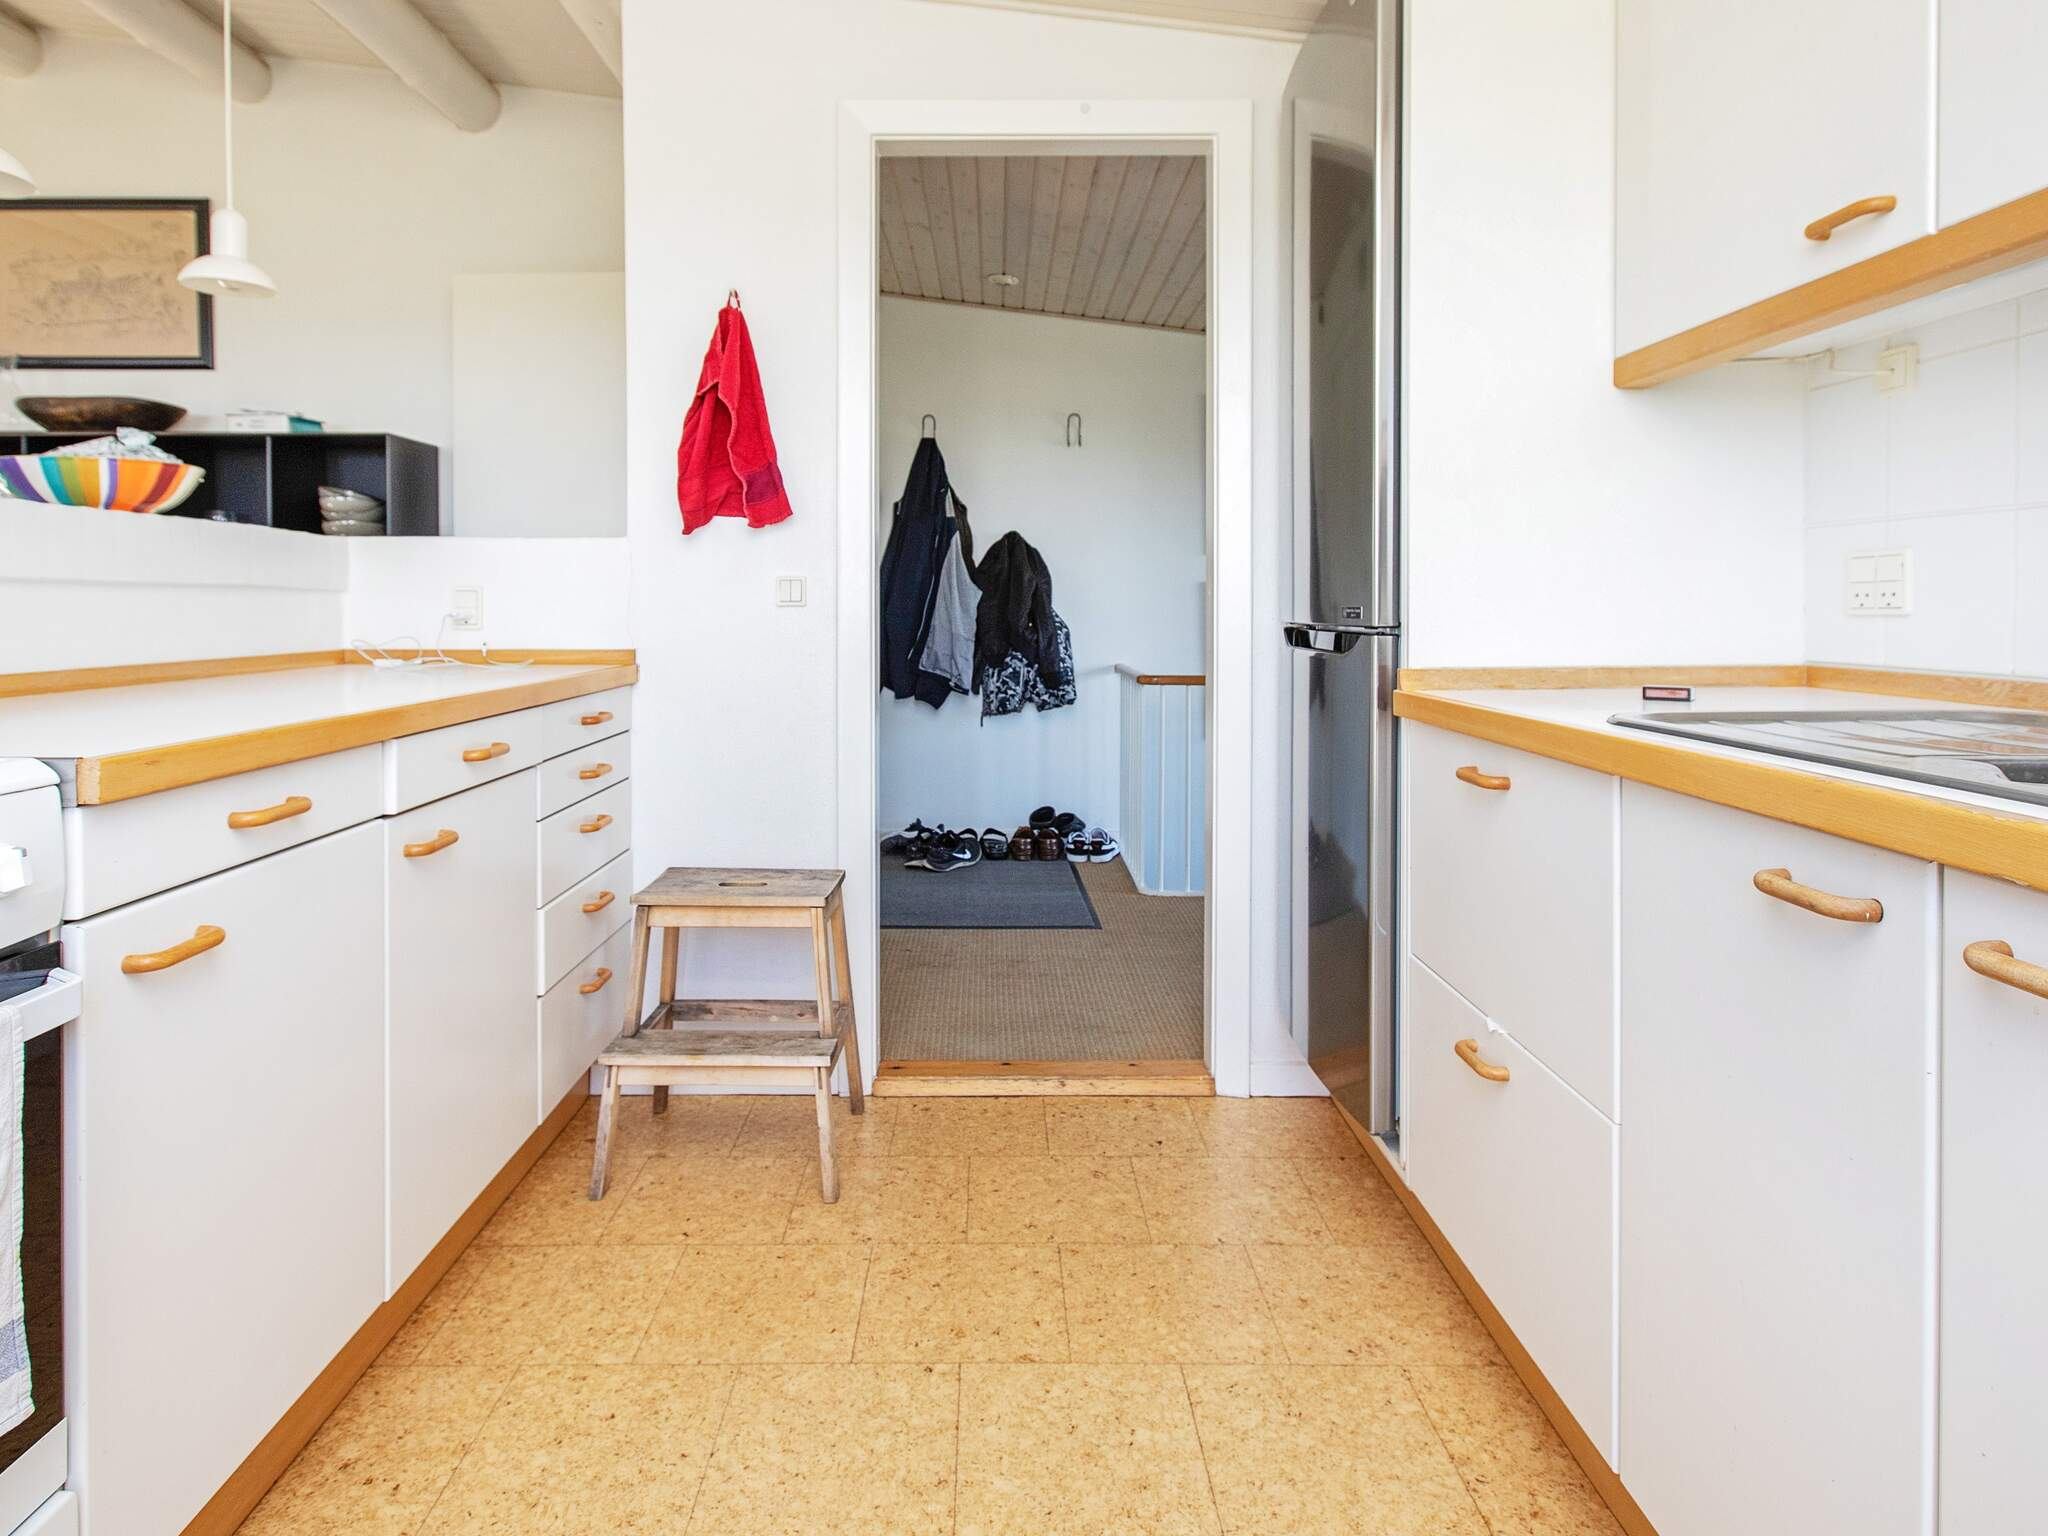 Ferienhaus Vejby Strand (2527287), Vejby, , Nordseeland, Dänemark, Bild 5